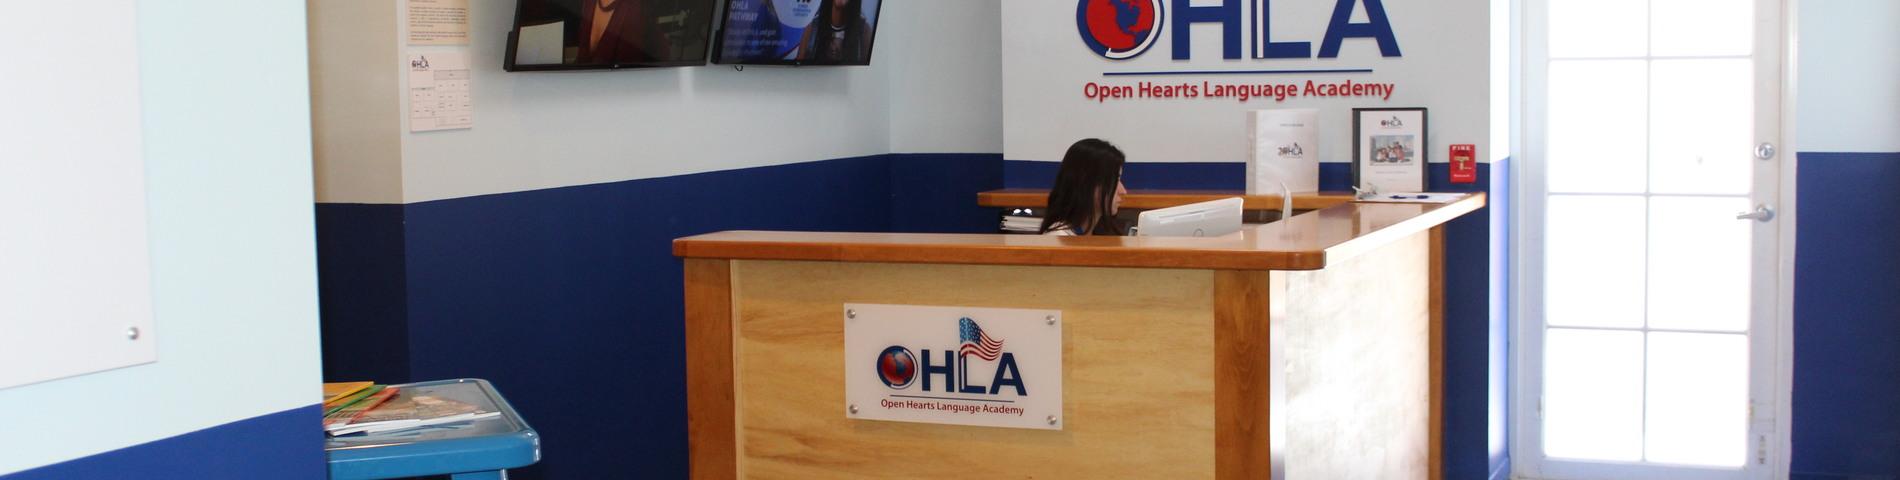 Open Hearts Language Academy bild 1